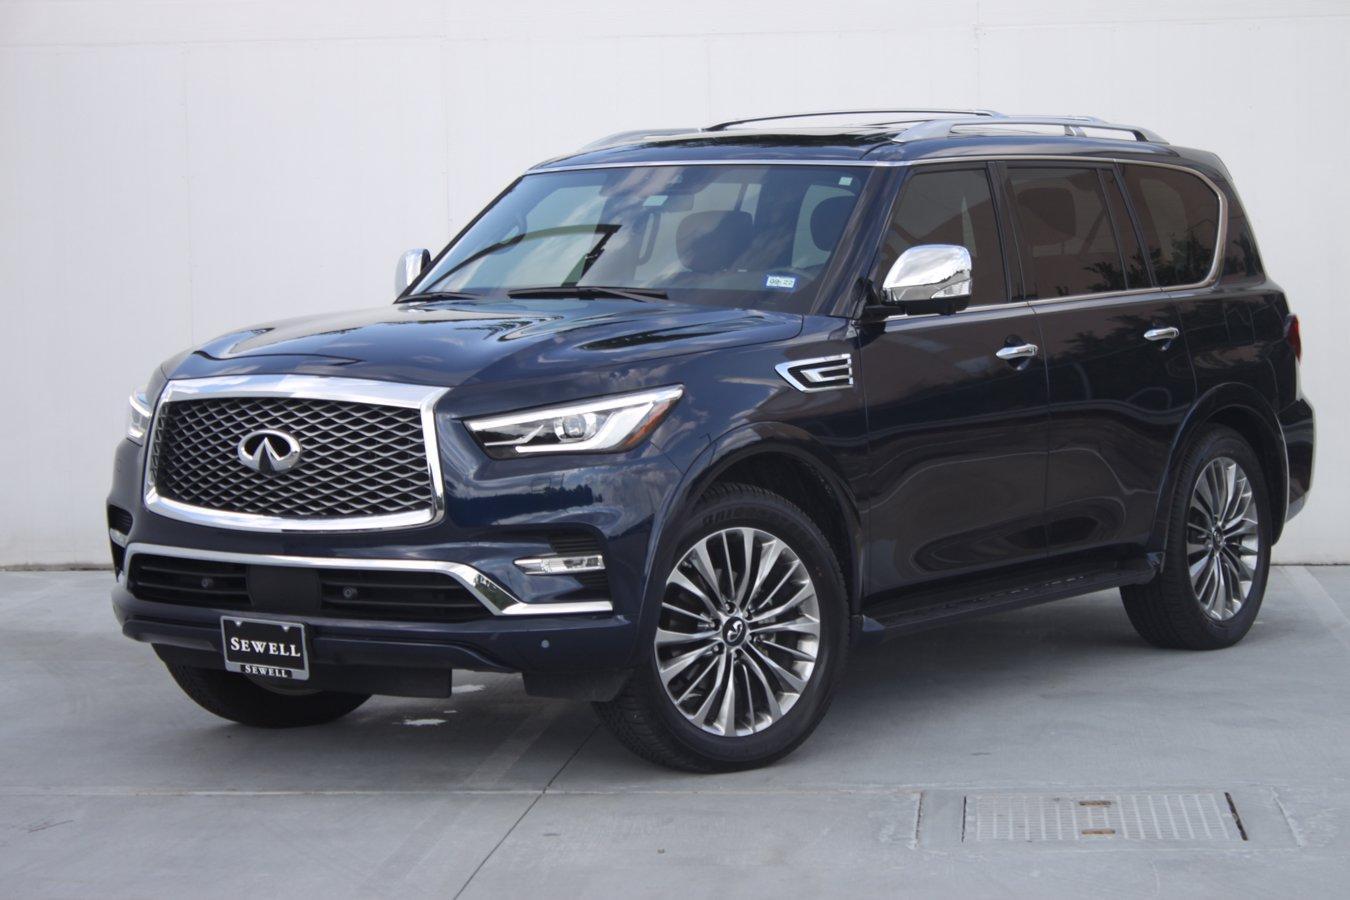 2021 INFINITI QX80 Vehicle Photo in Houston, TX 77090